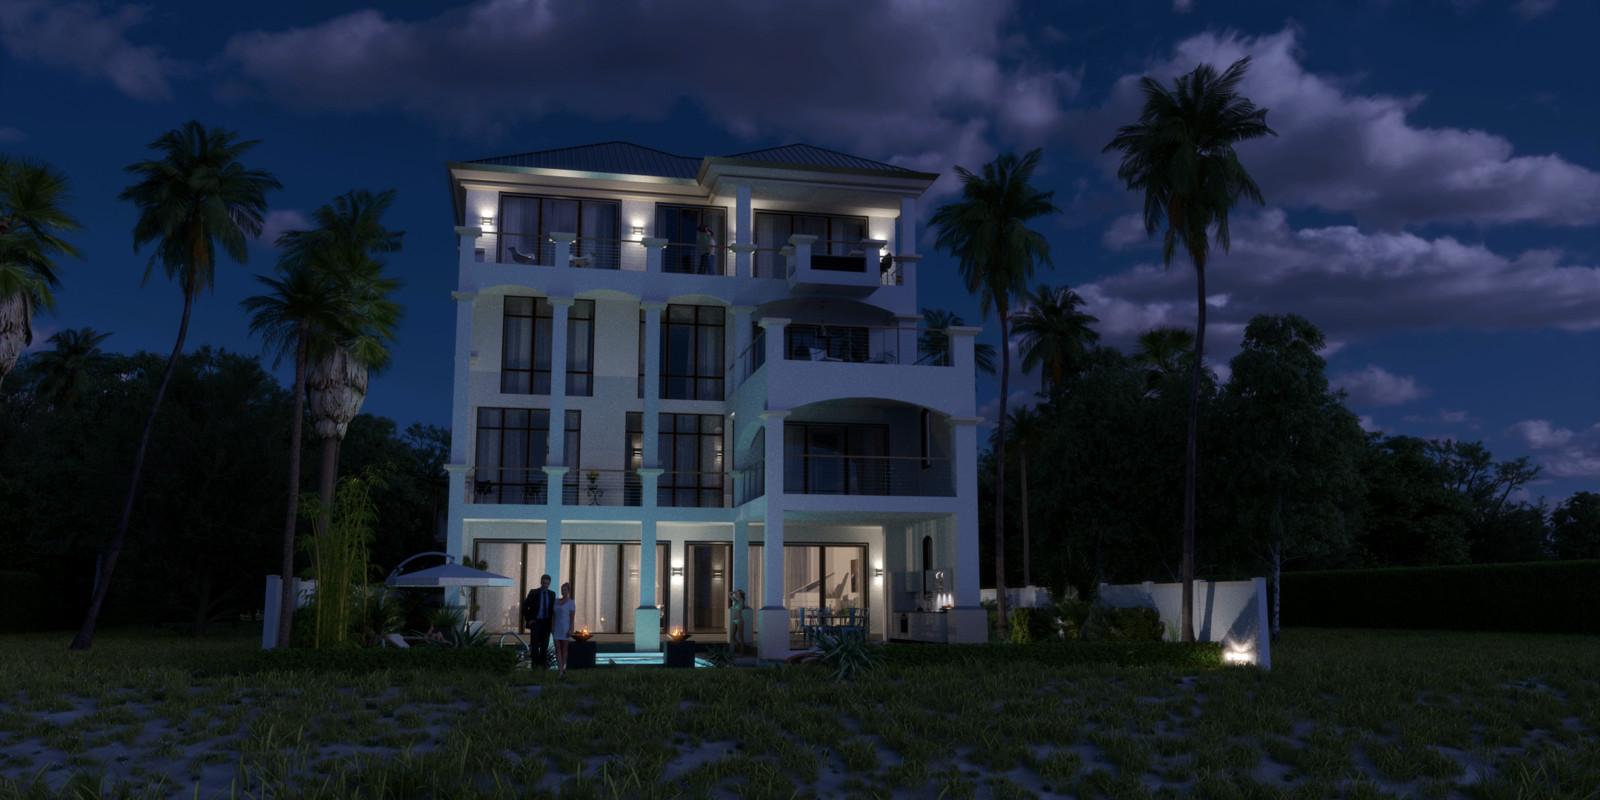 SketchUp + Thea Render  Seagrove Beach House: Scene 1 Night C Glare Bob 2160 × 1080 Presto MC Bucket  HDR used (HQ version) by @HDRI-SKIES http://hdri-skies.com/shop/hdri-sky-162/